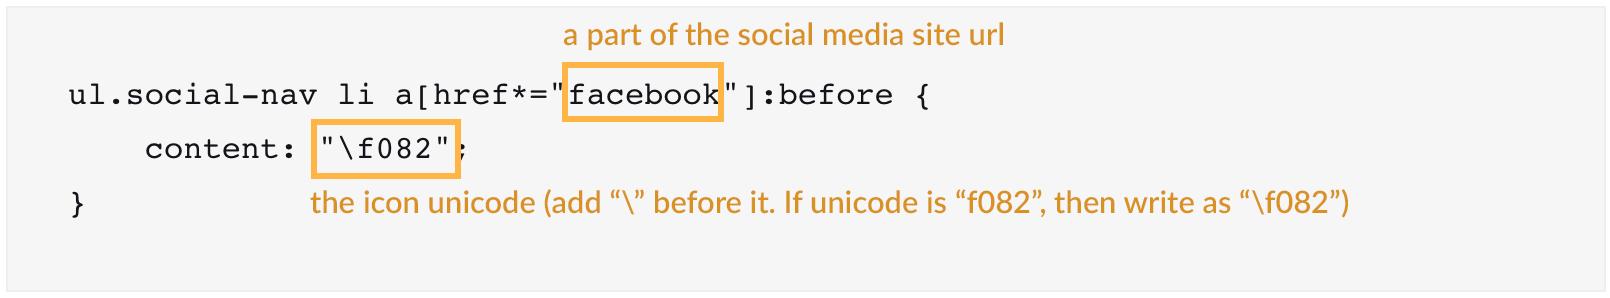 custom-code-explaination